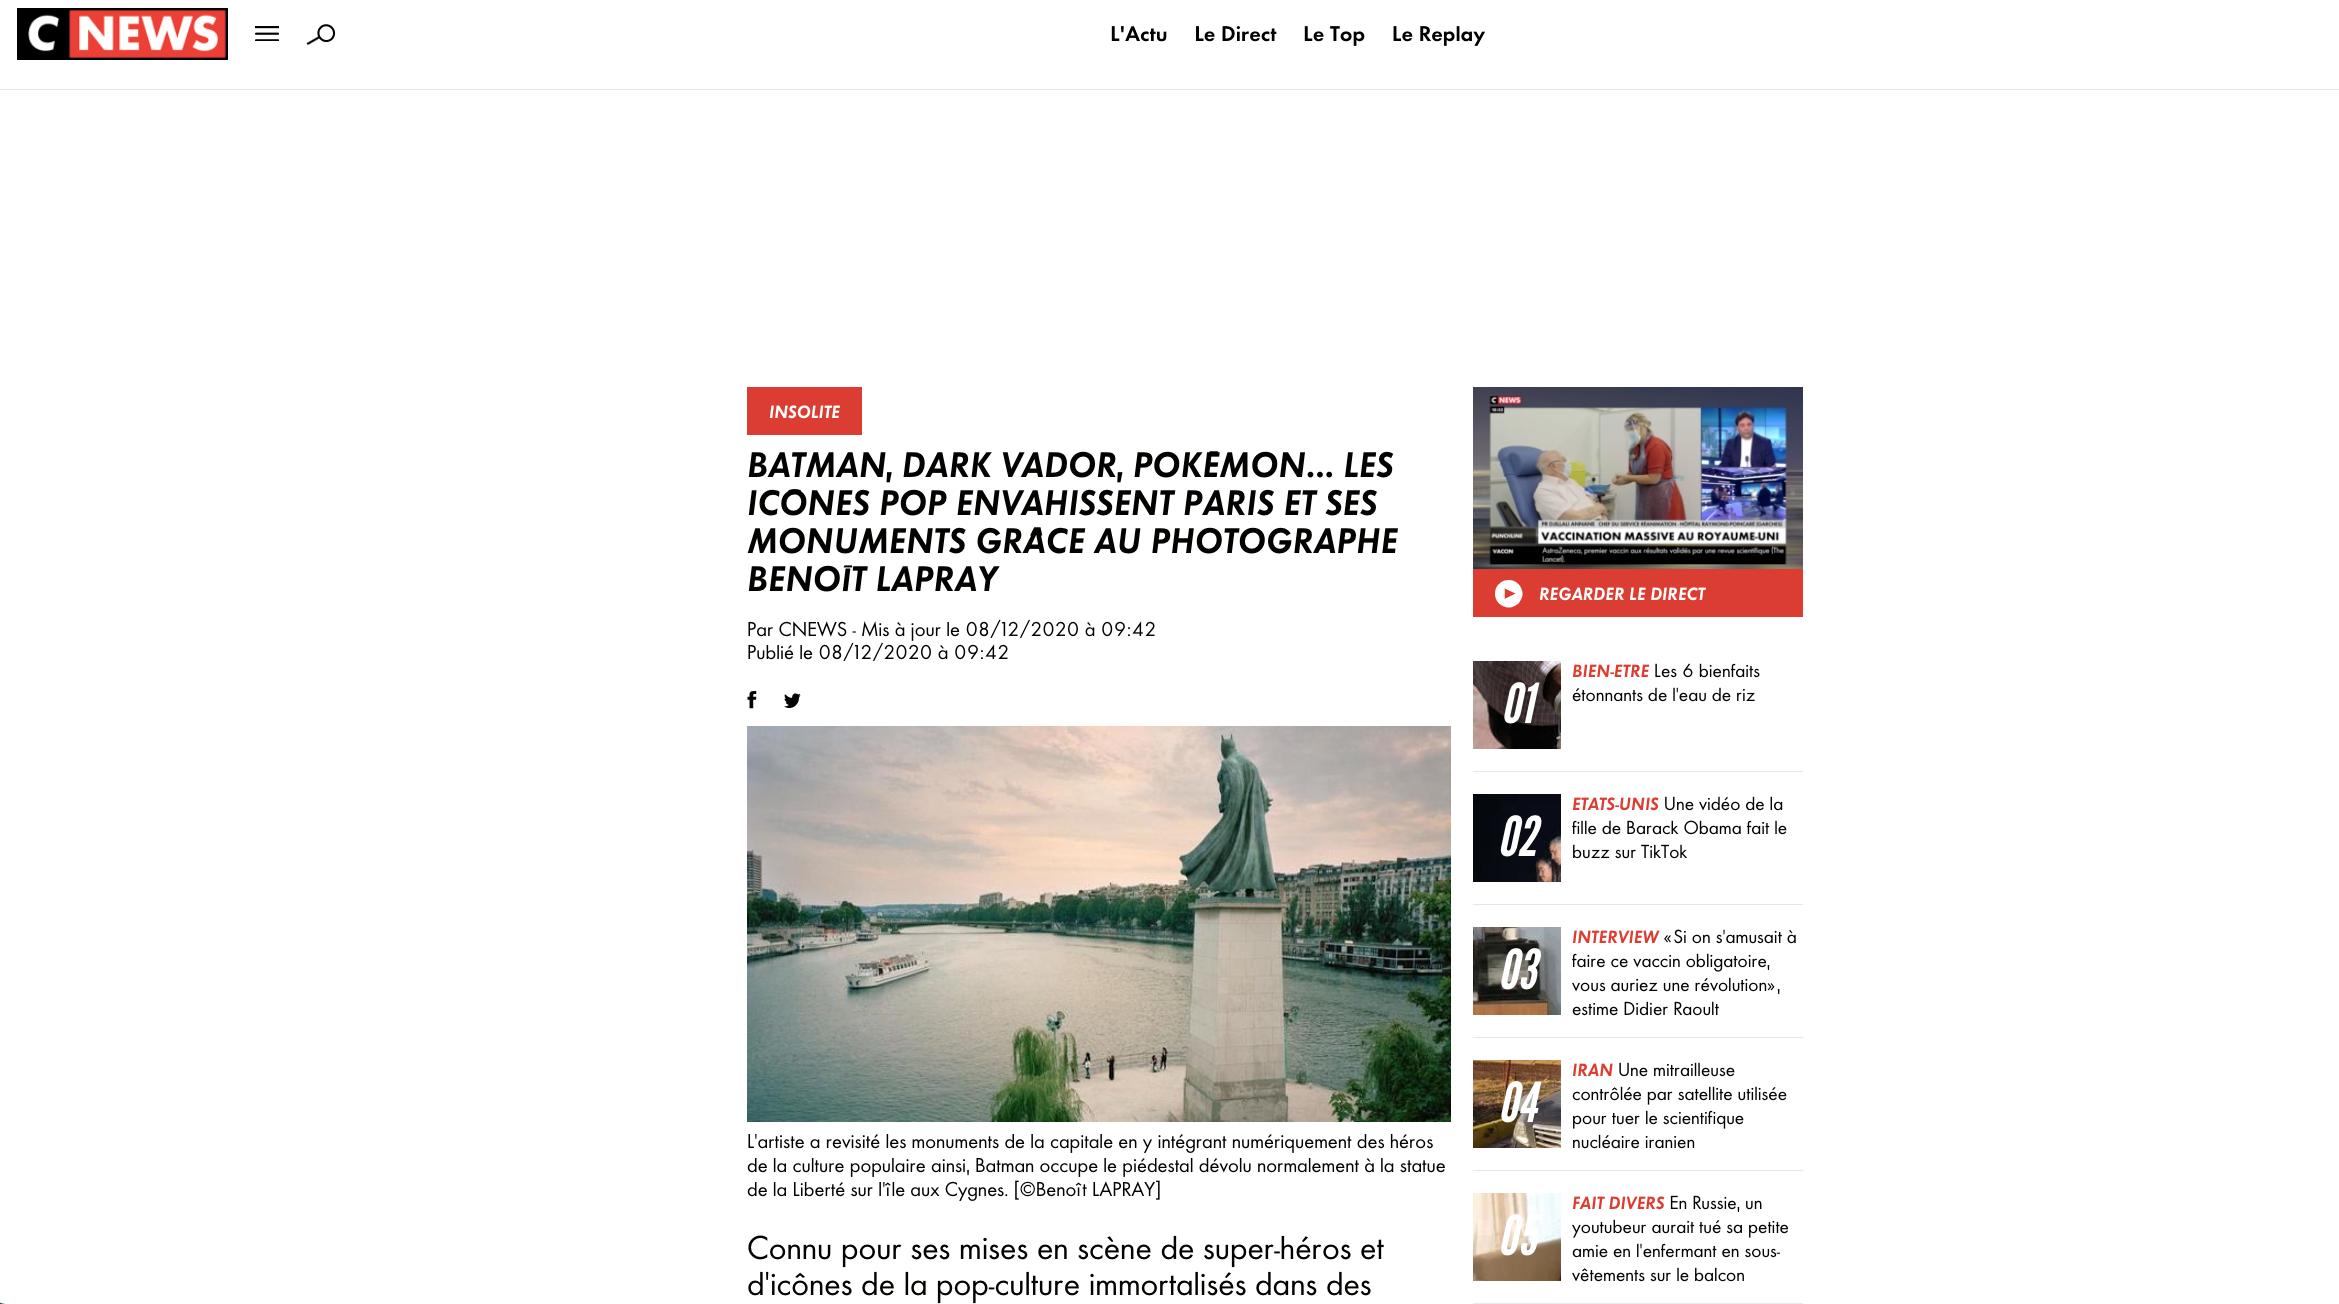 CNEWS (France)